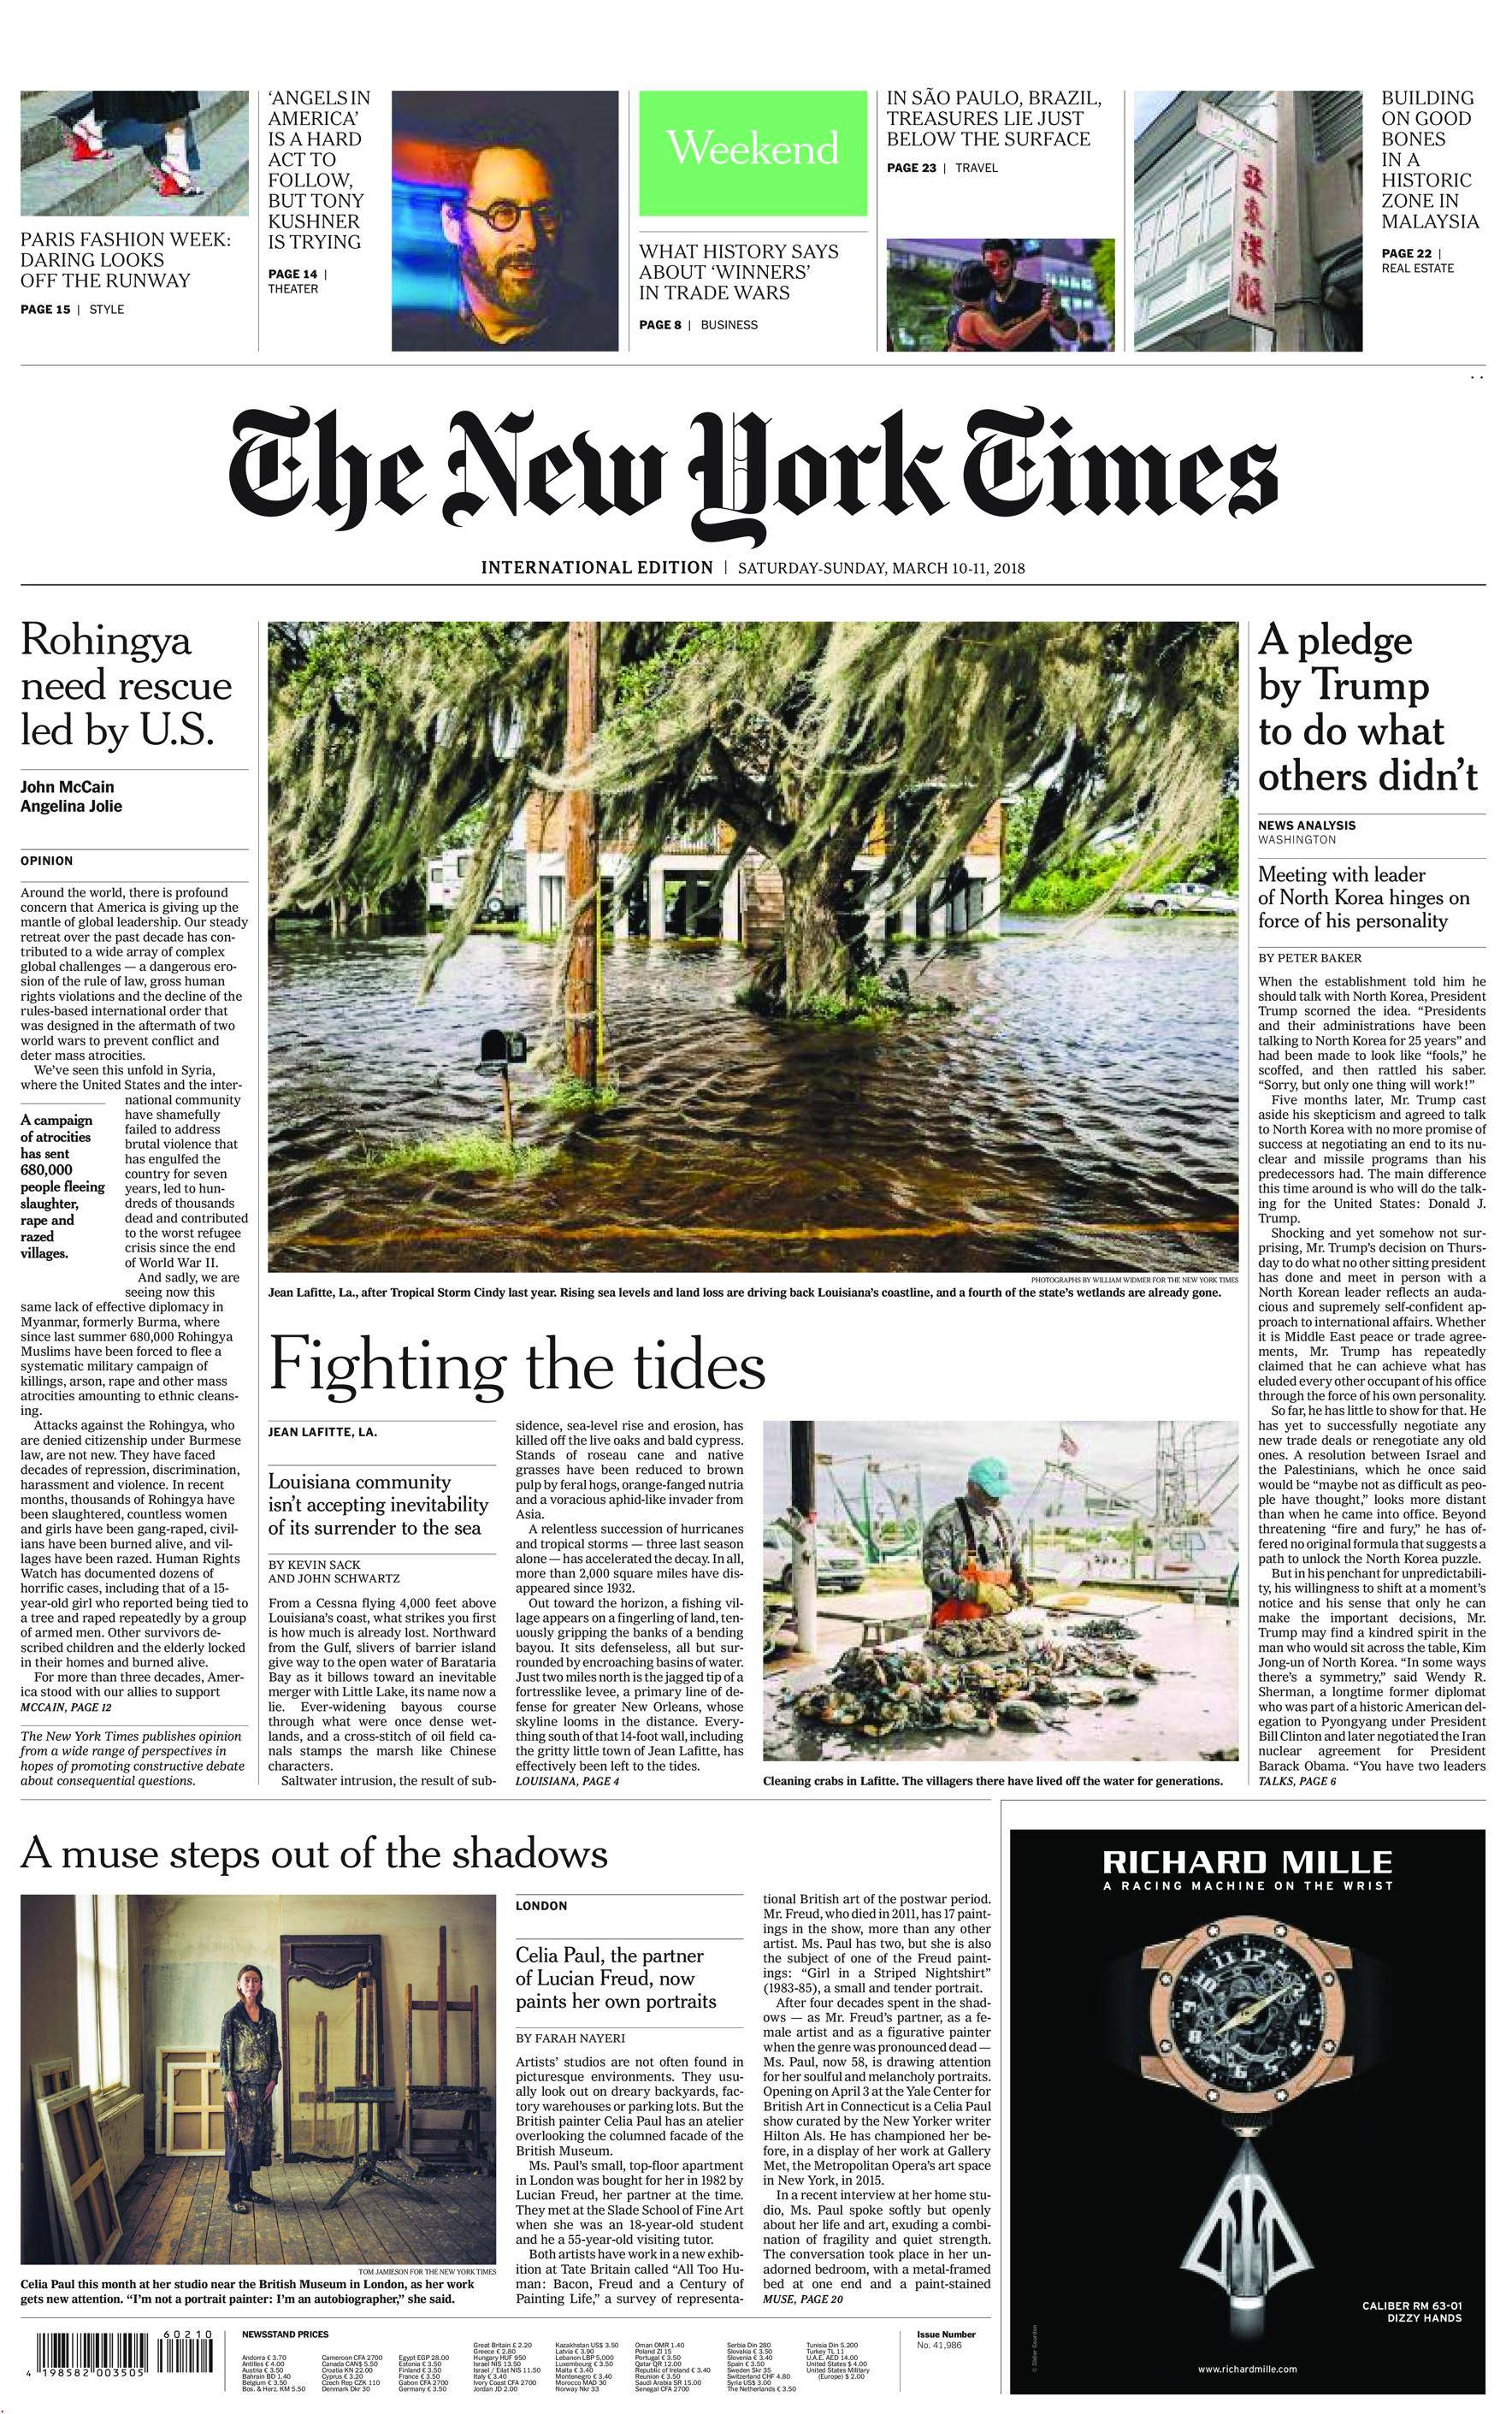 International New York Times - 10 March 2018